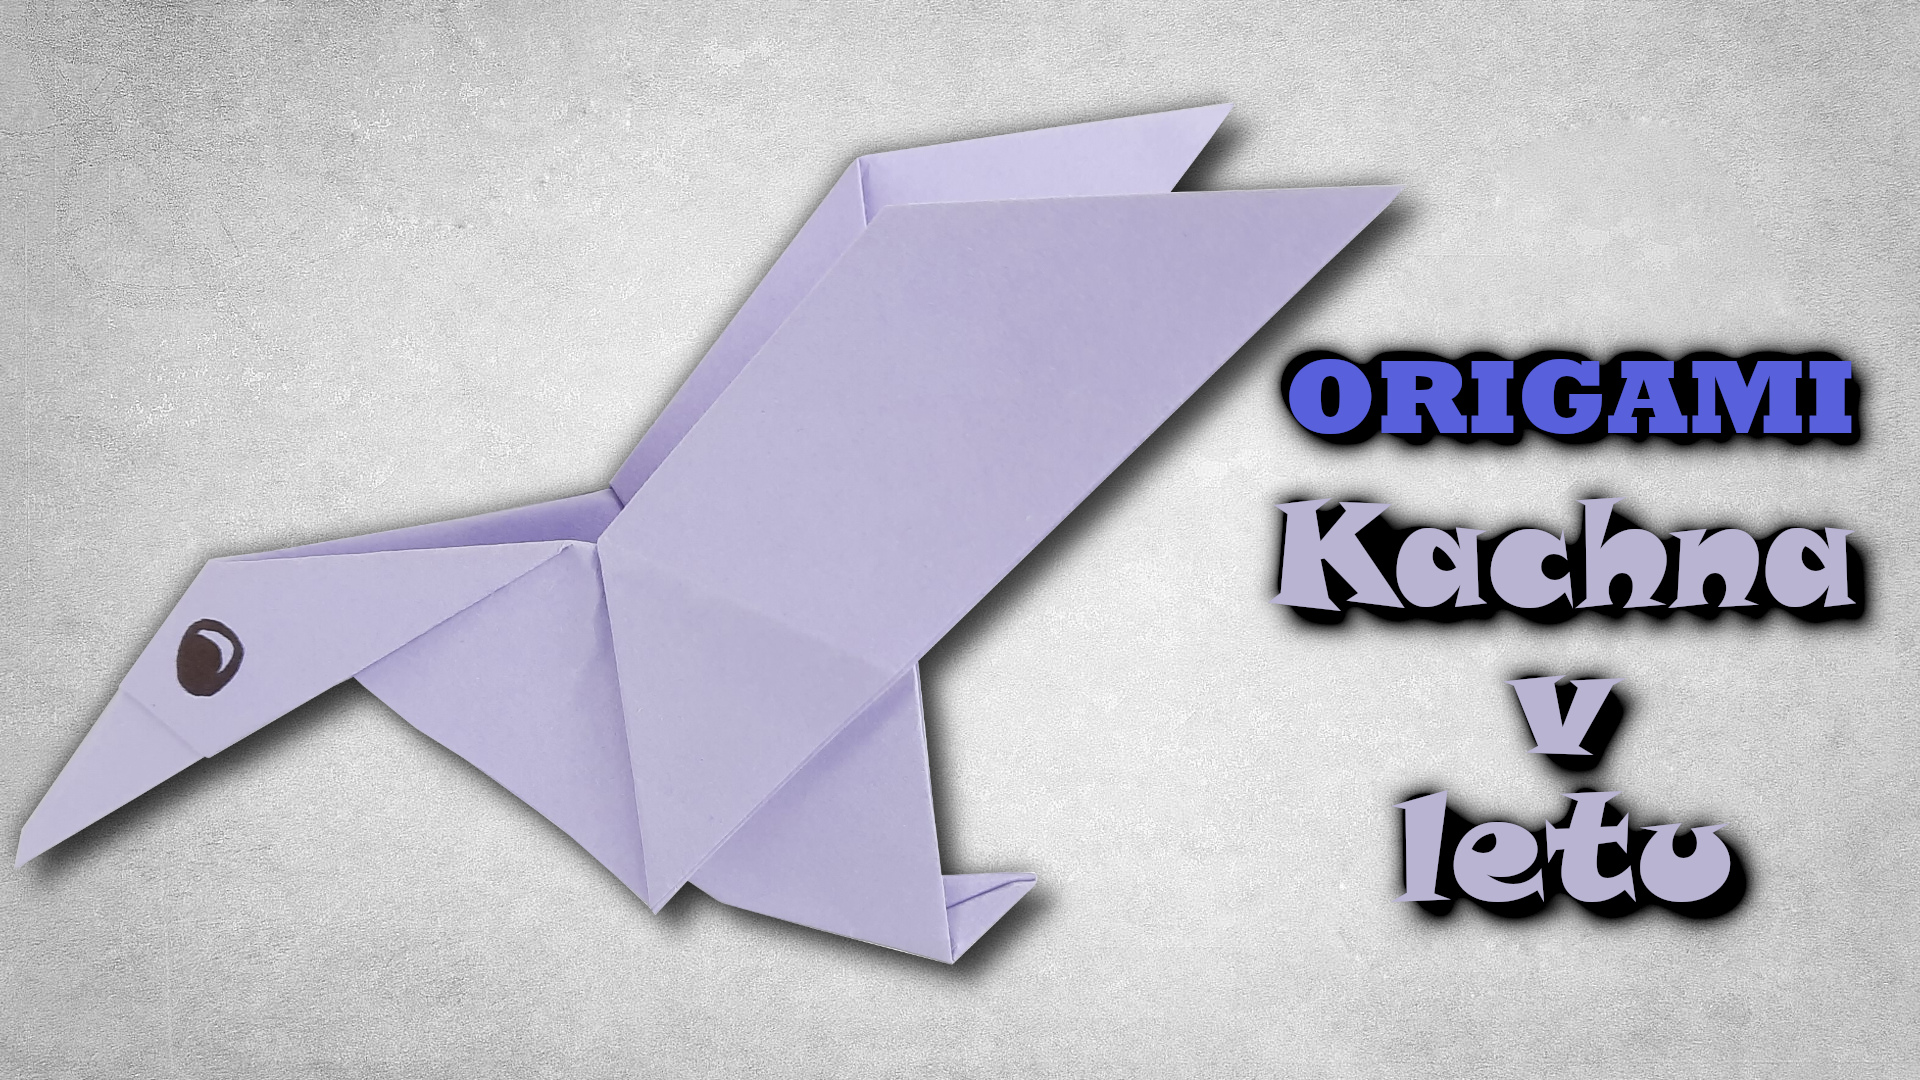 Origami Kachna v letu